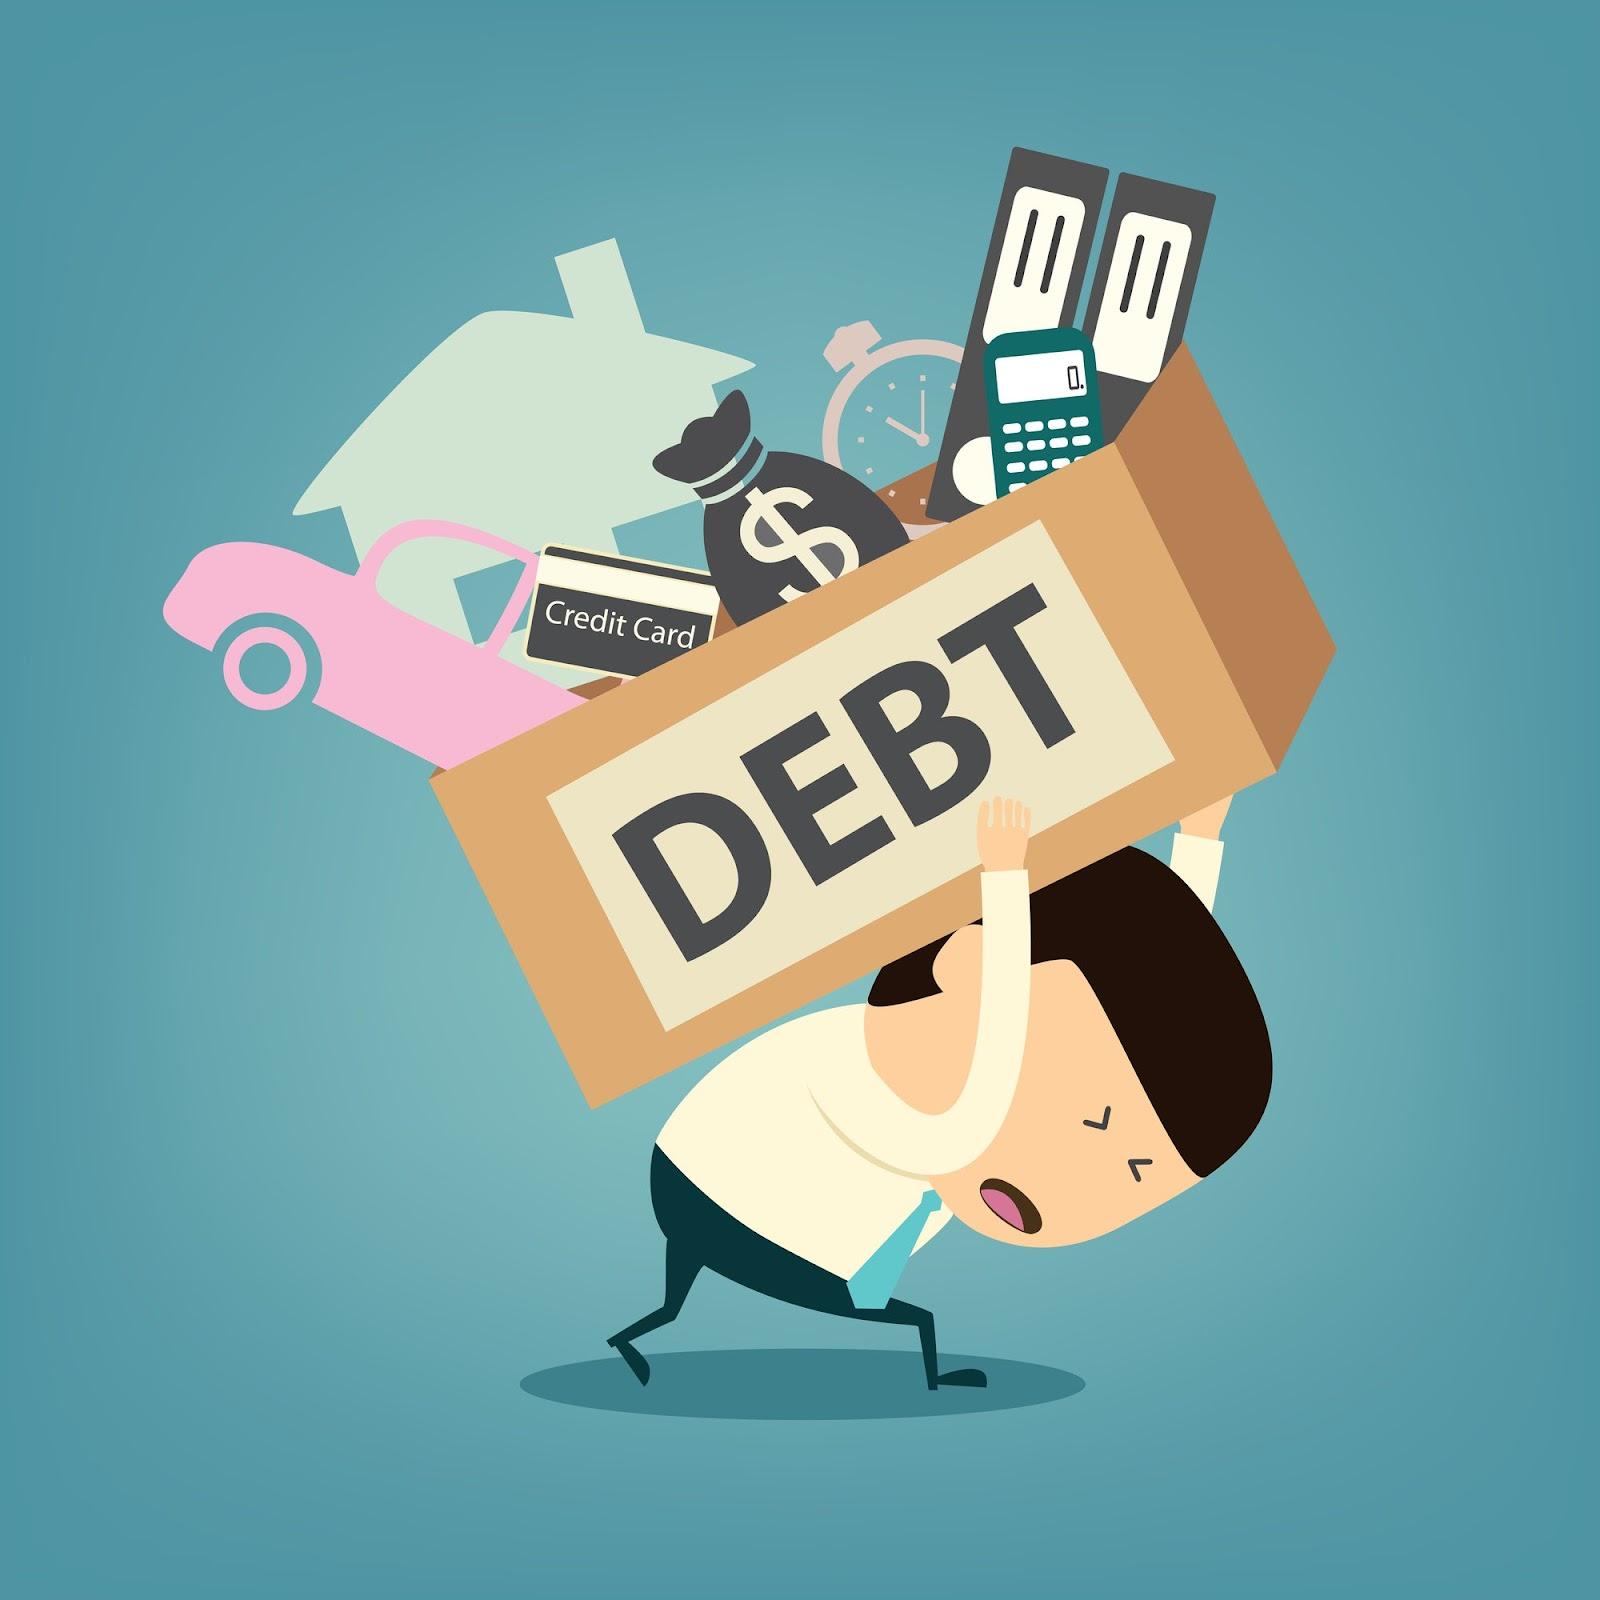 Cartoon businessman carrying debt box on his back